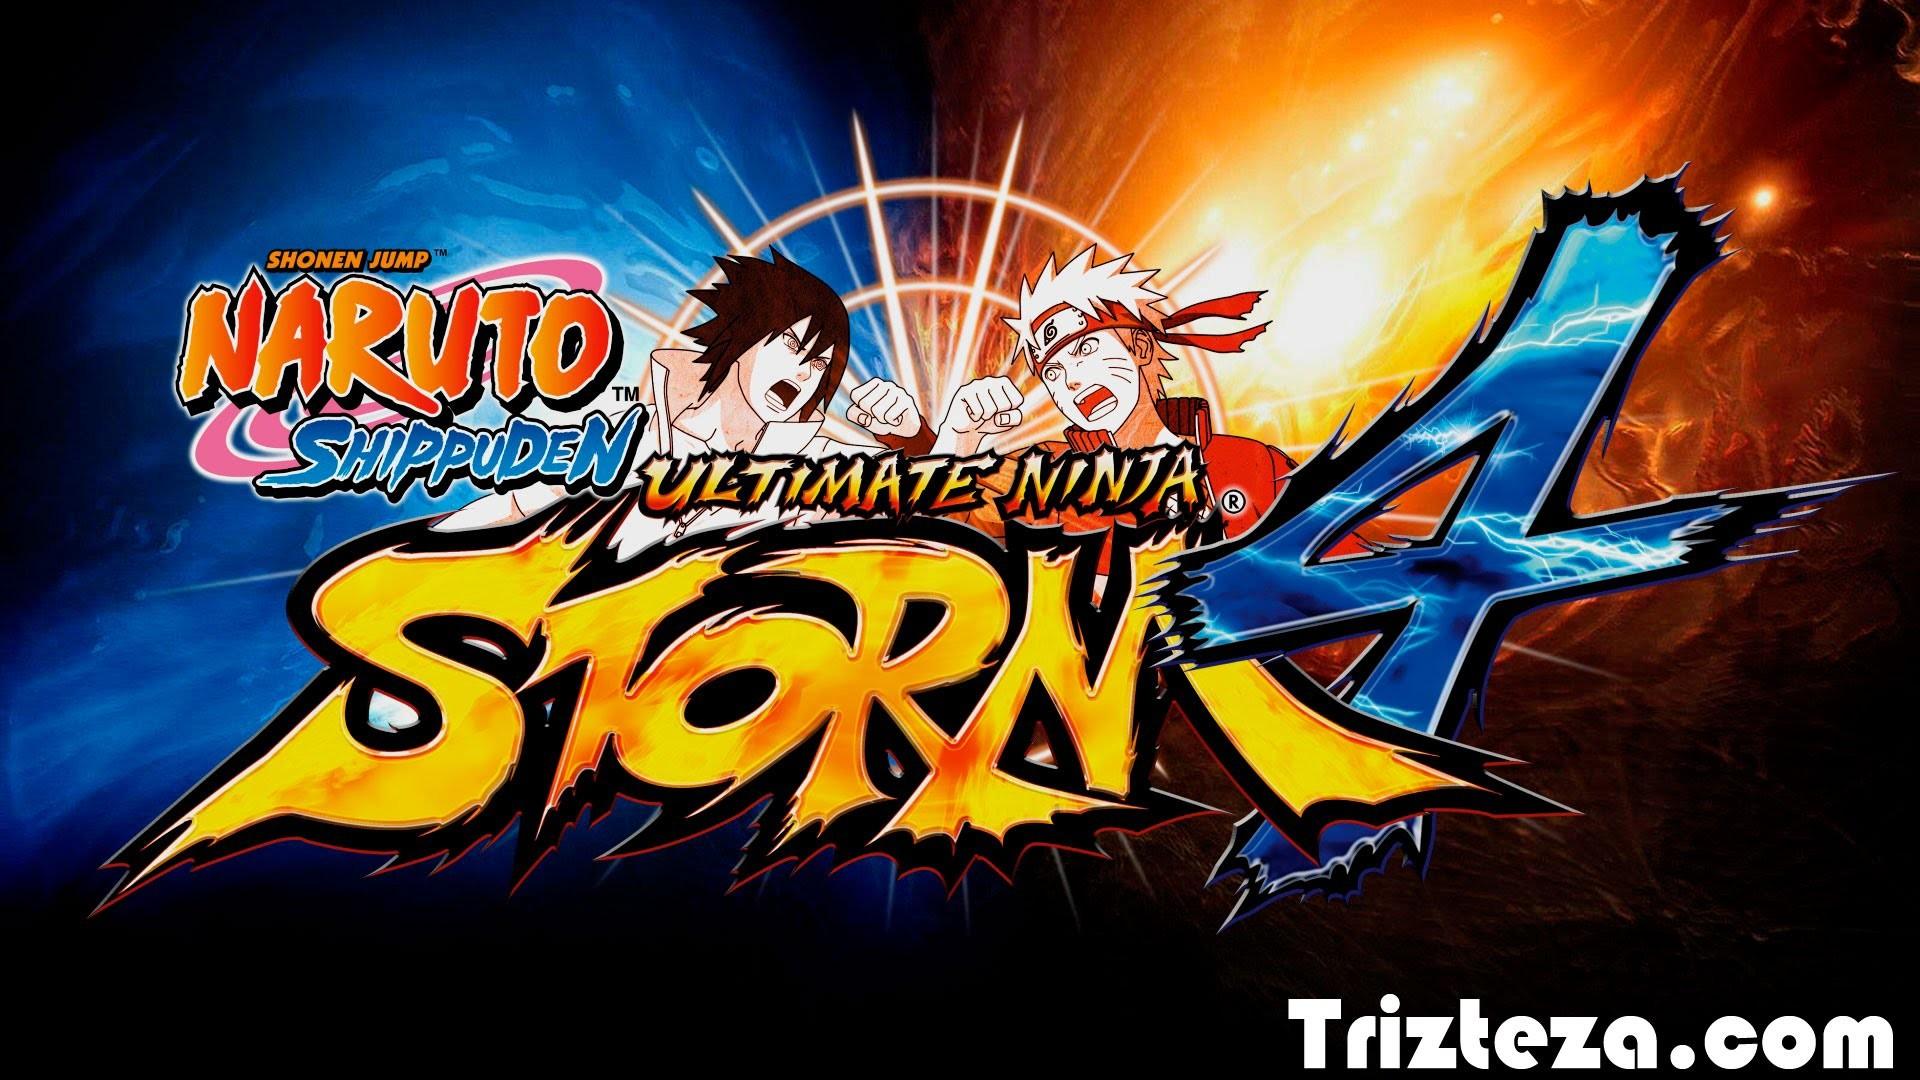 Naruto Vs Sasuke Luta Final – Naruto Ultimate Ninja Storm 4 PC